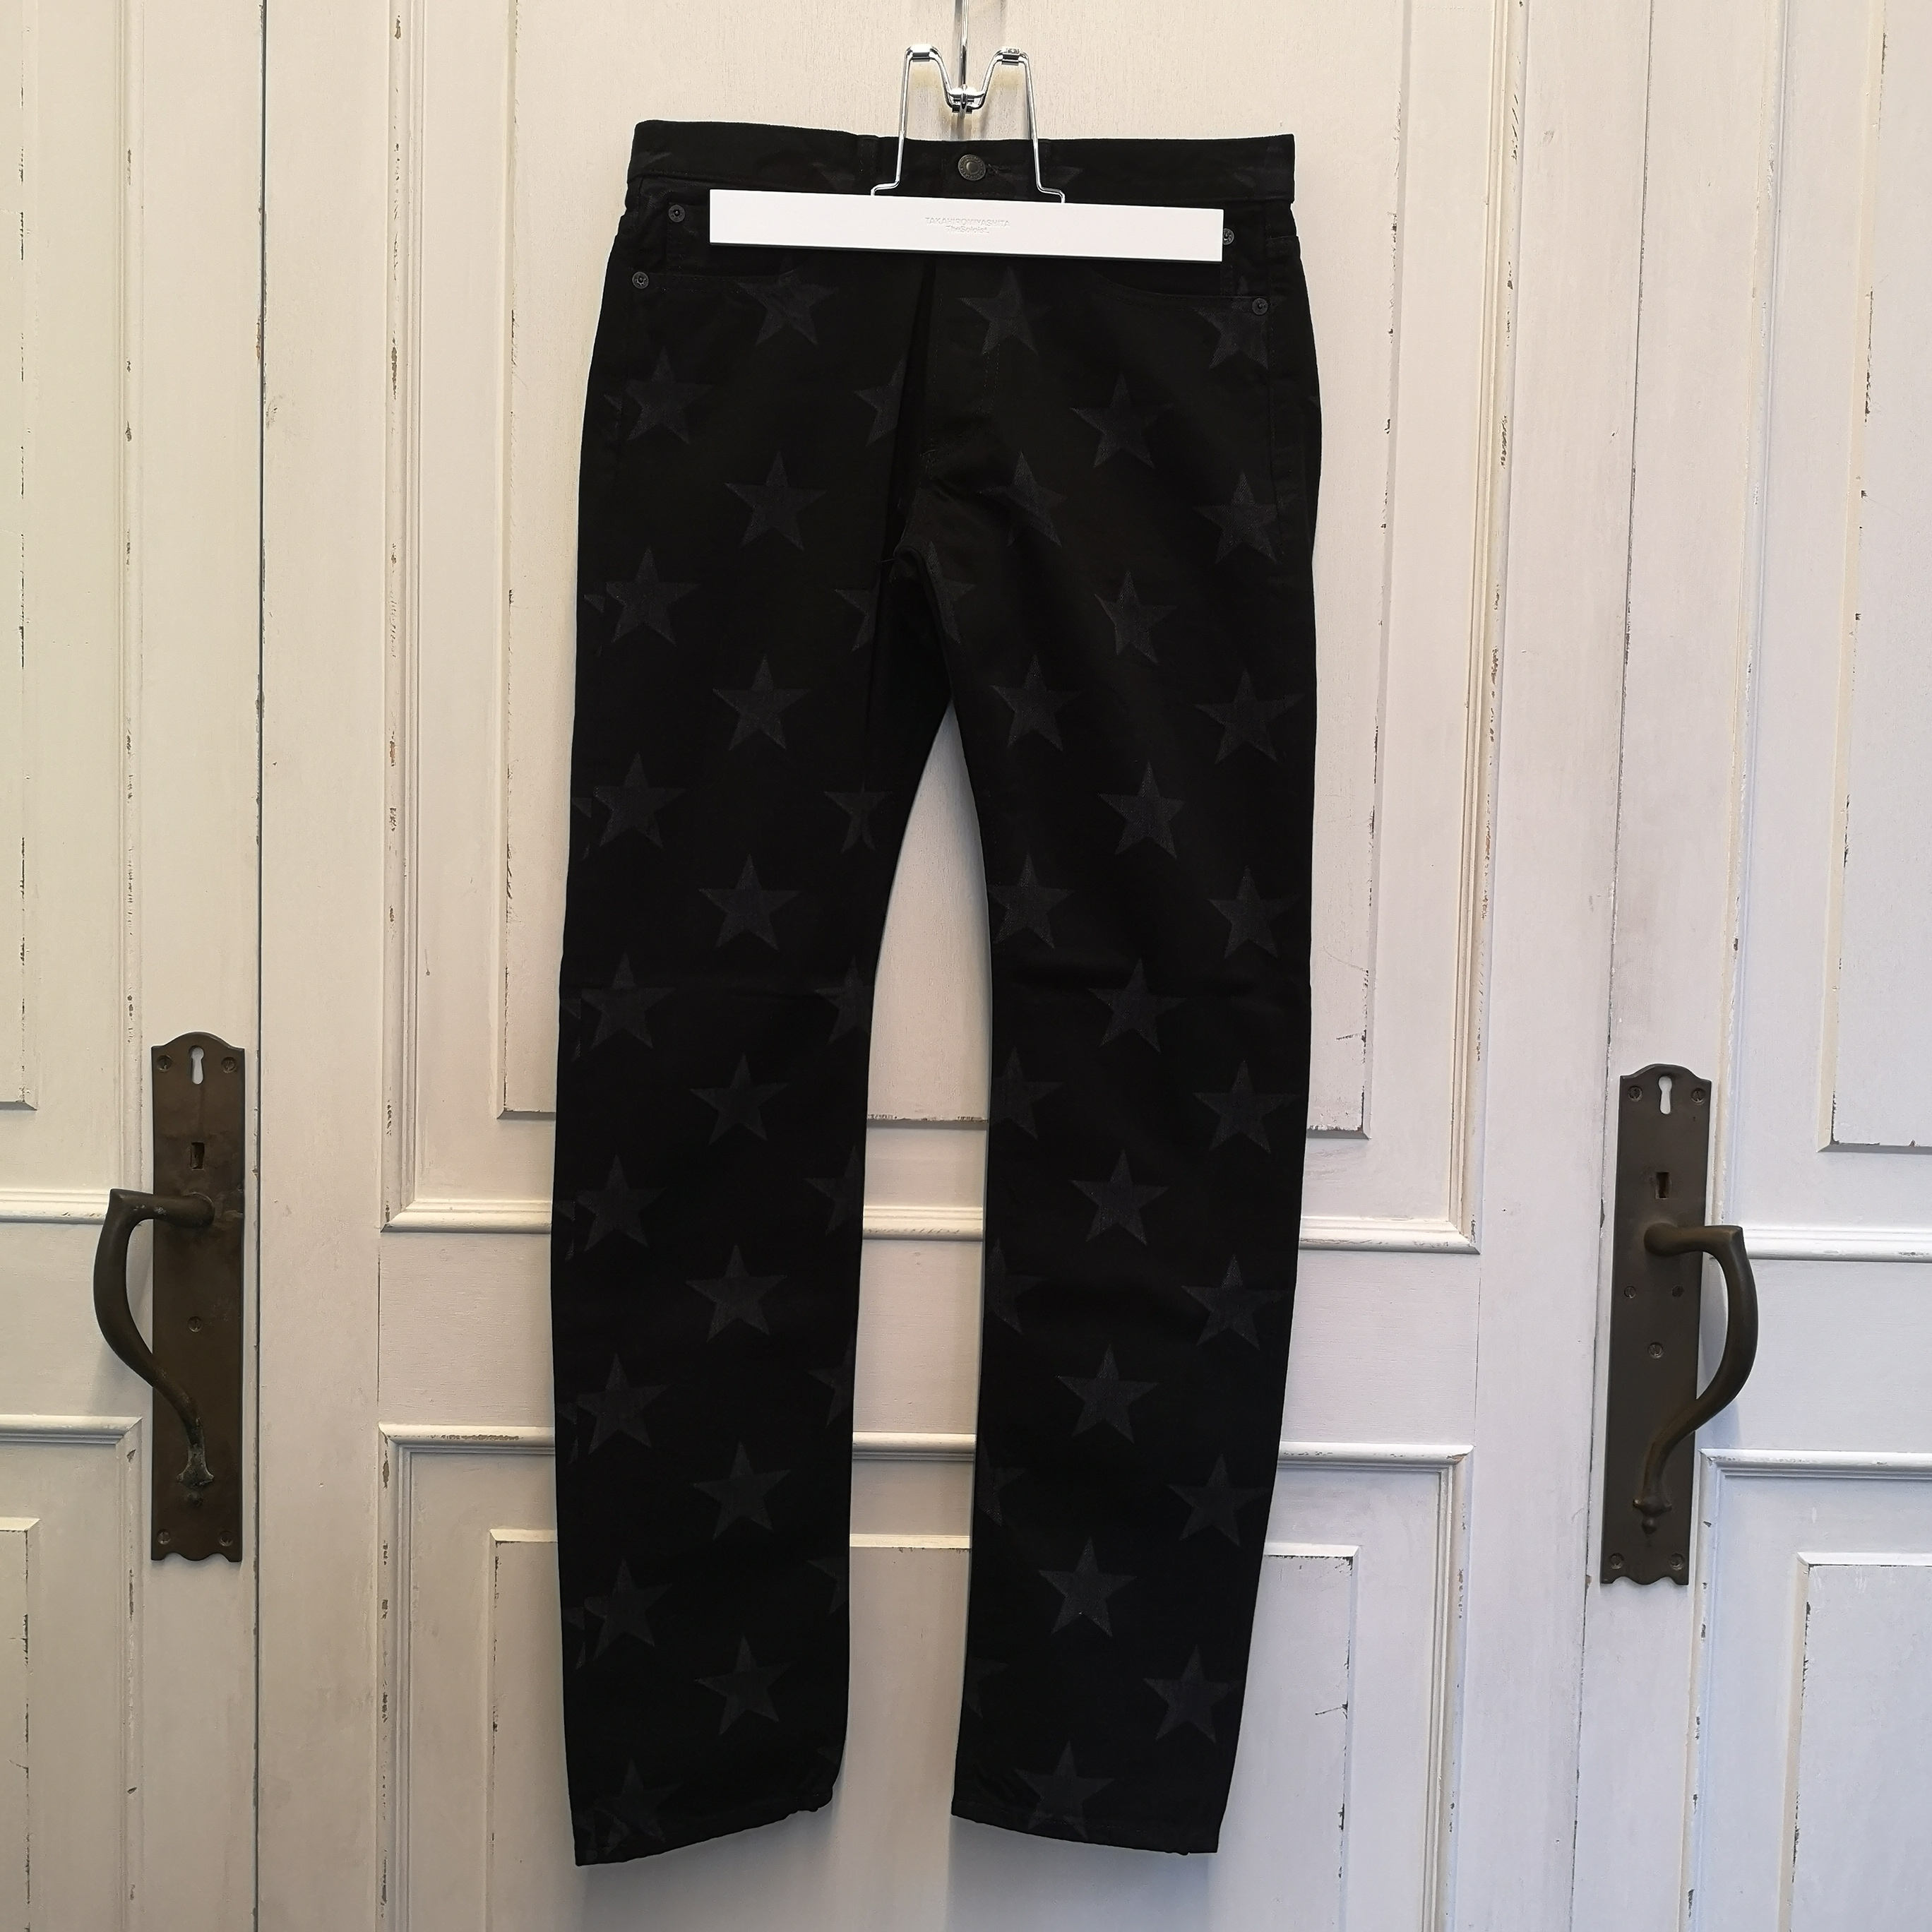 smd.0005SS20 star patterned slim straight 6 pocket jean.